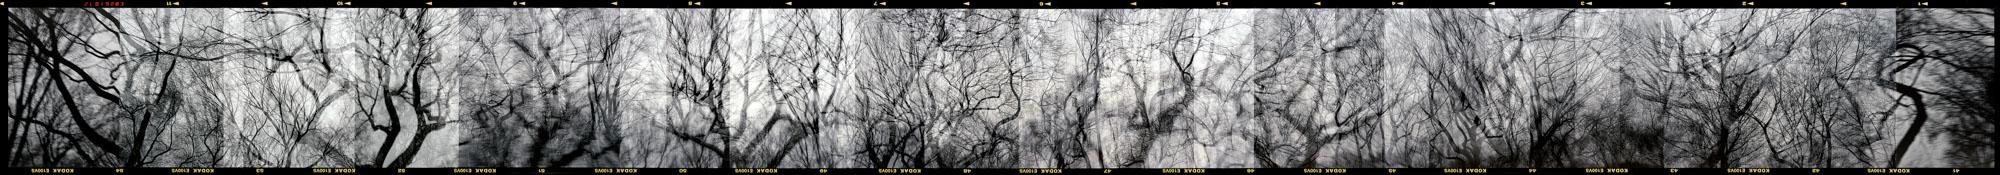 Central Park 1999